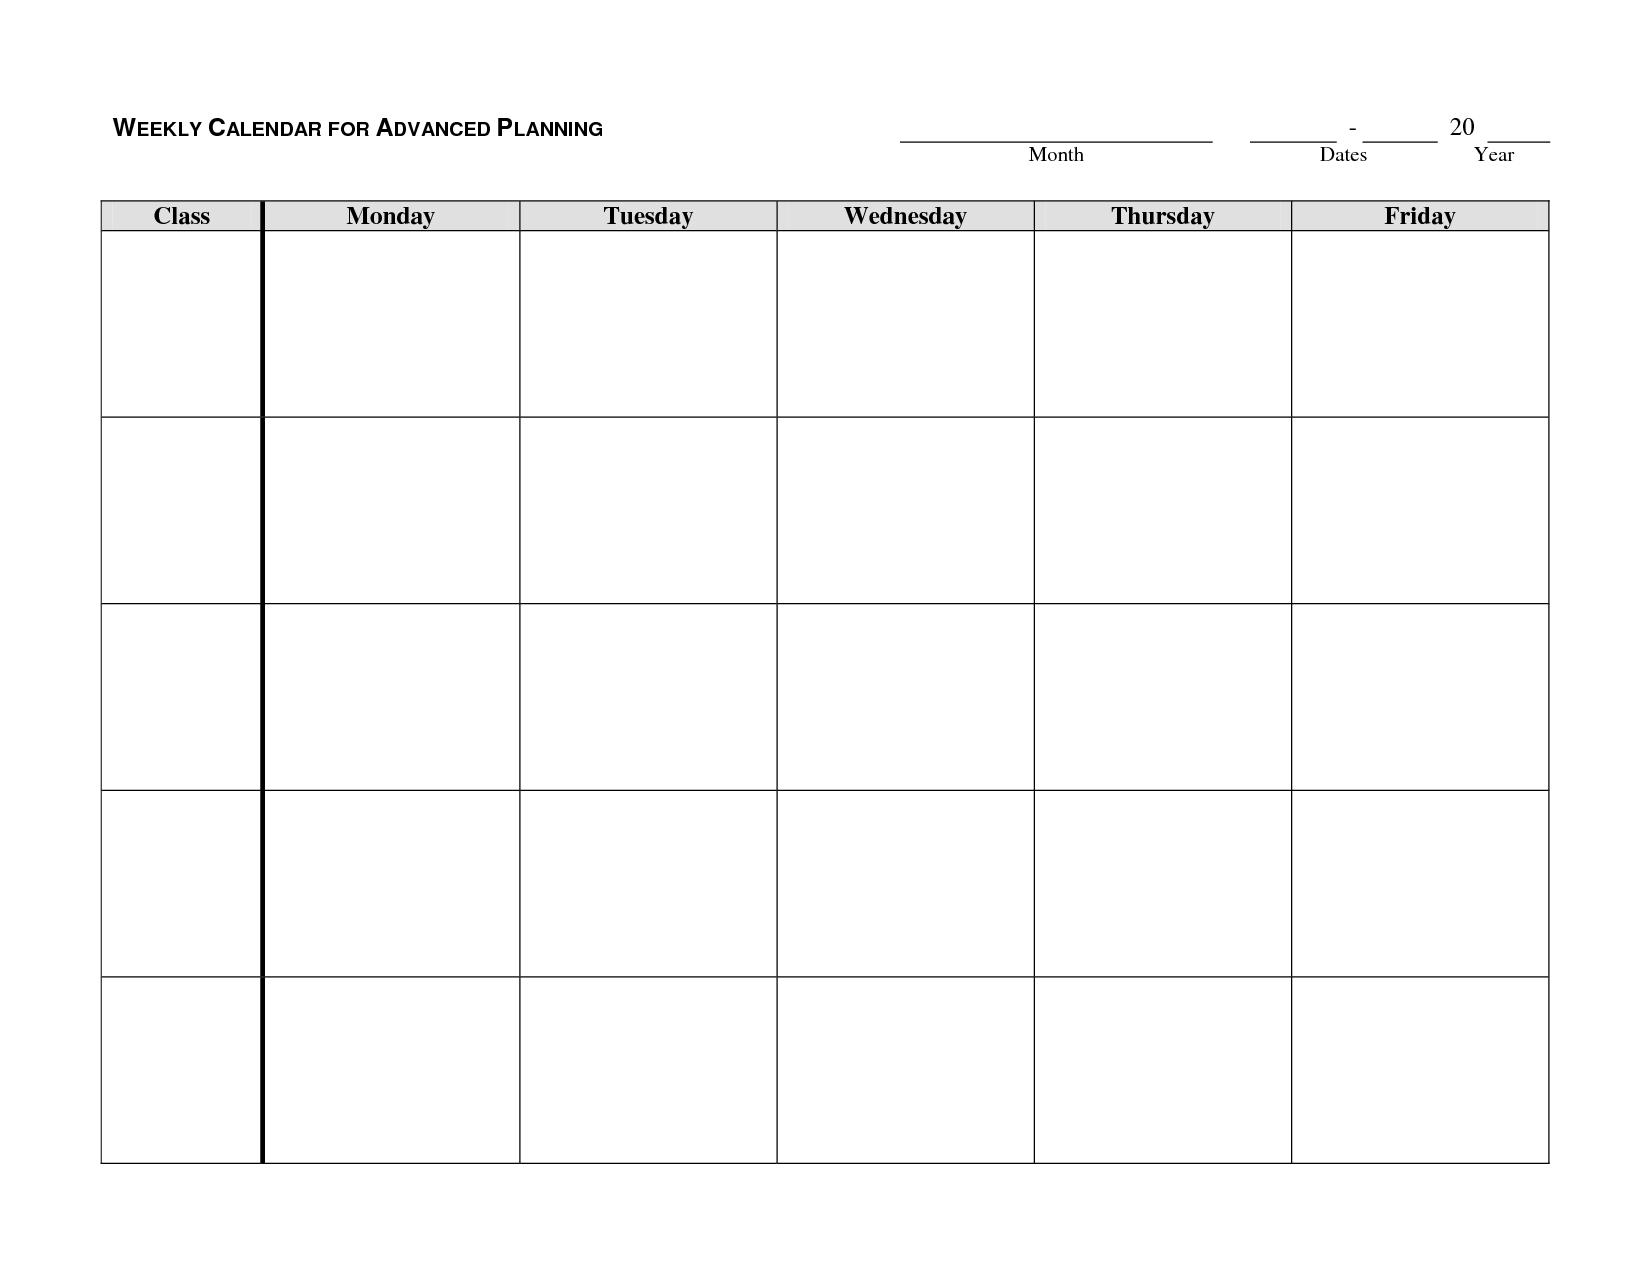 Weekly Calendar Template - Google Search | Autism/school-Calendar Template Monday Through Friday